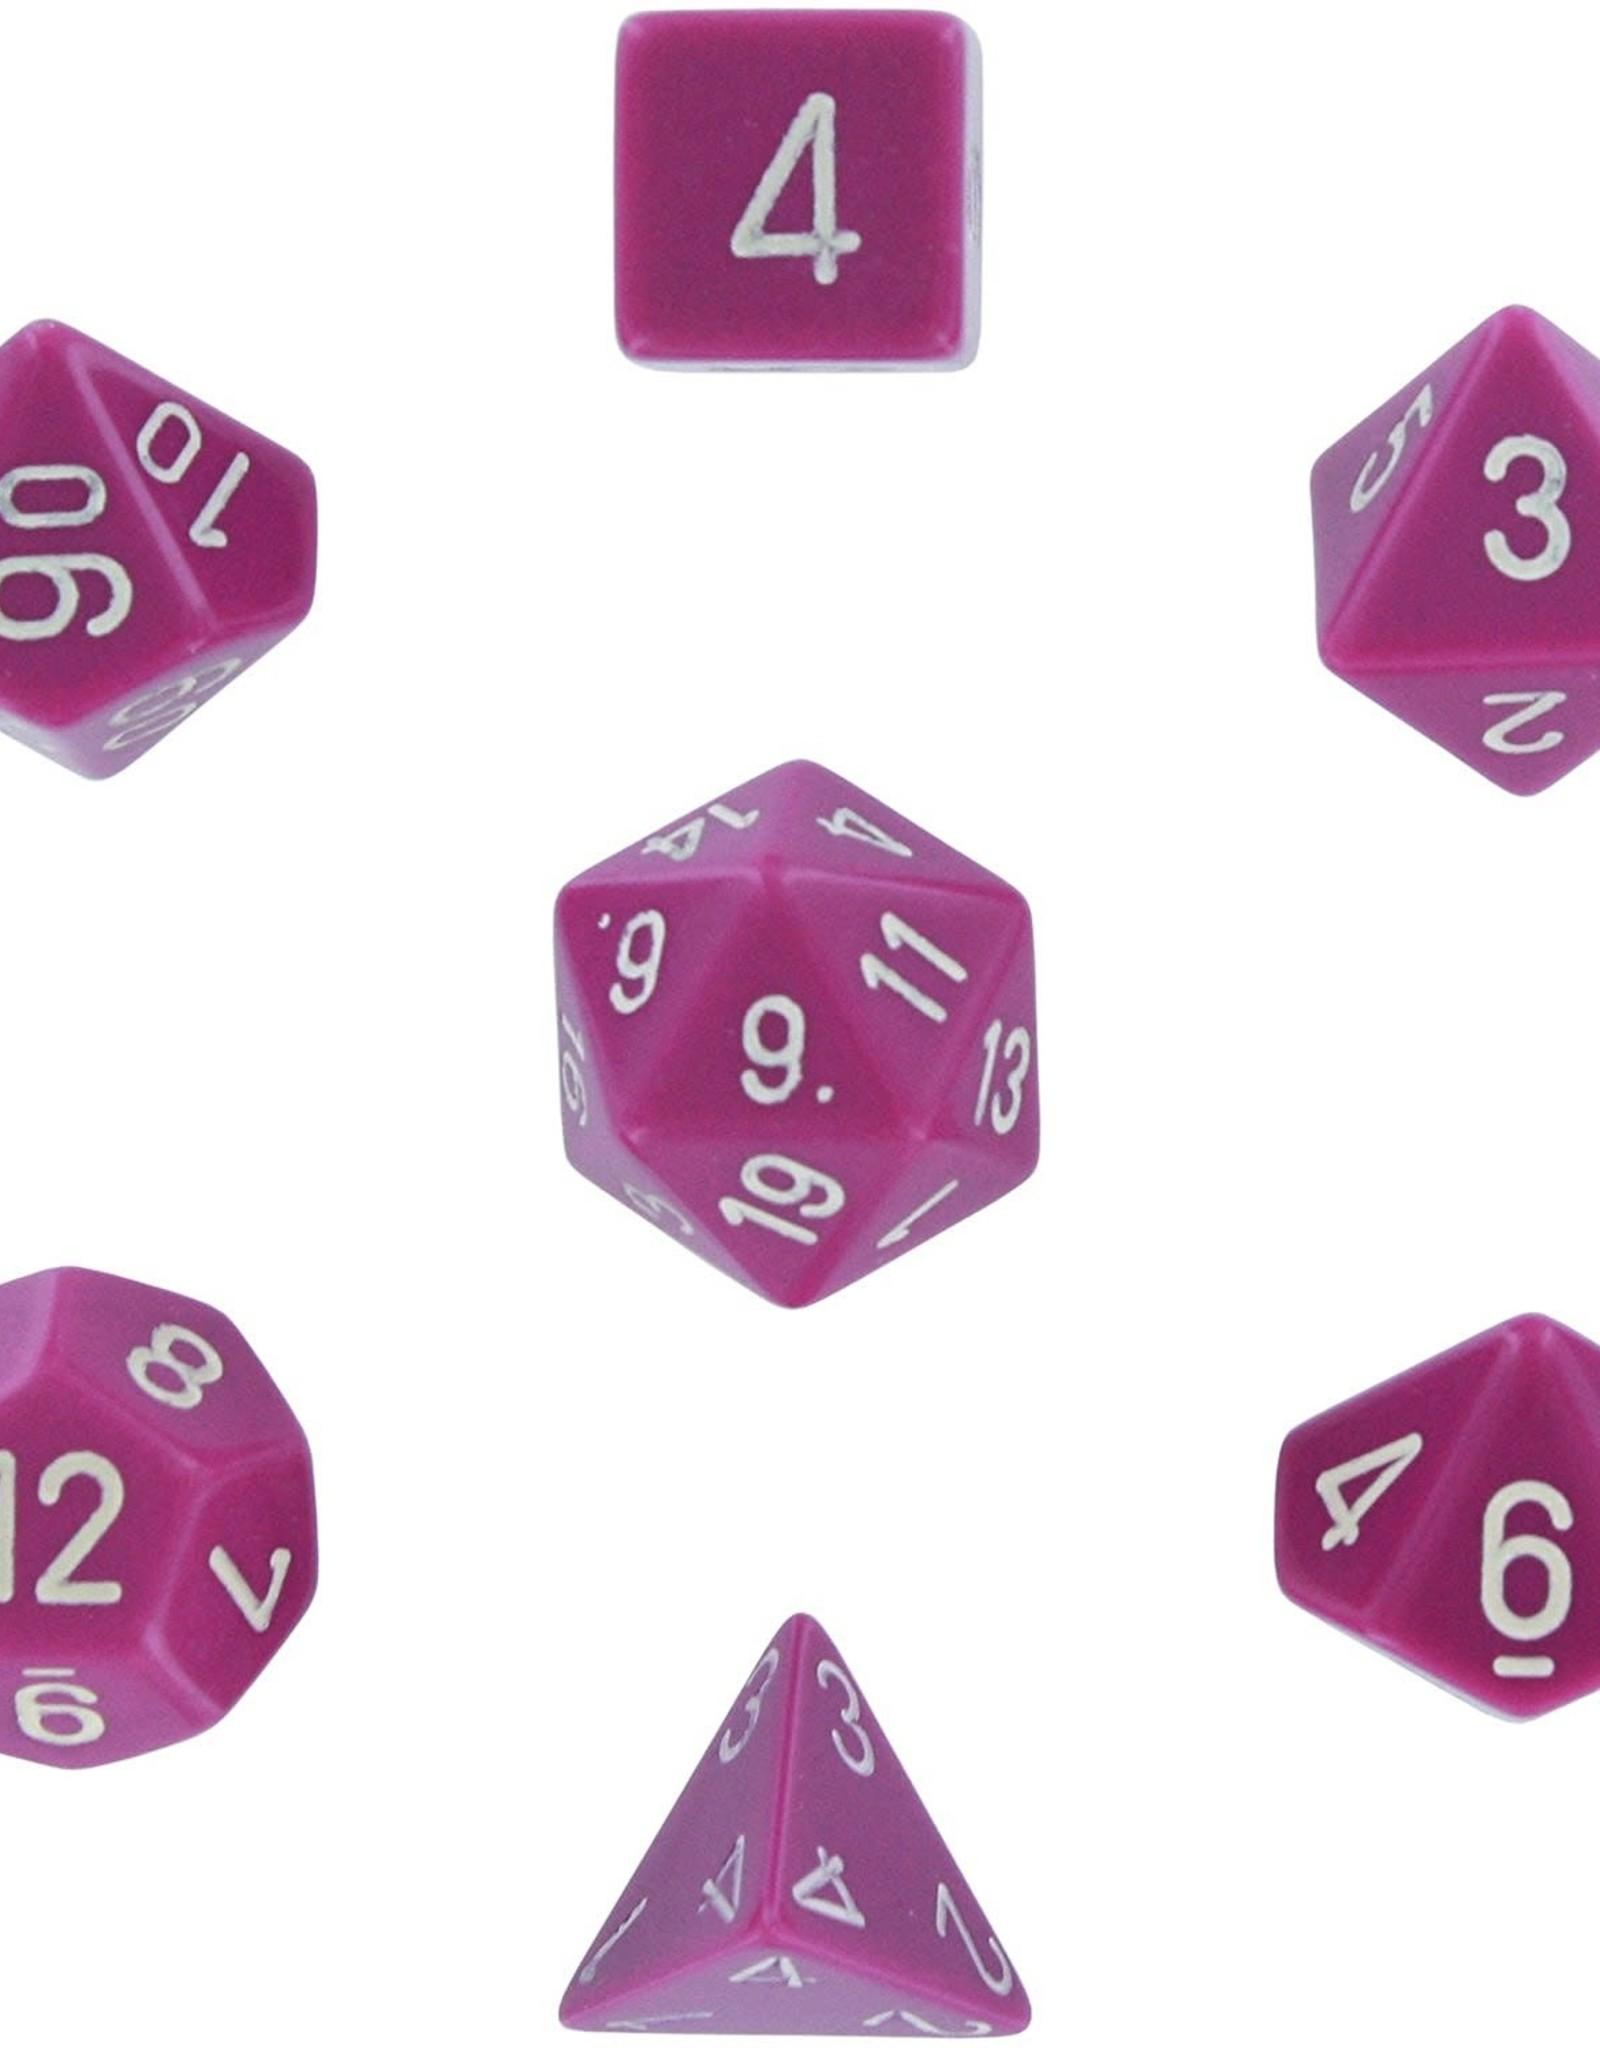 Chessex Dice Block 7ct. - Light Purple/White